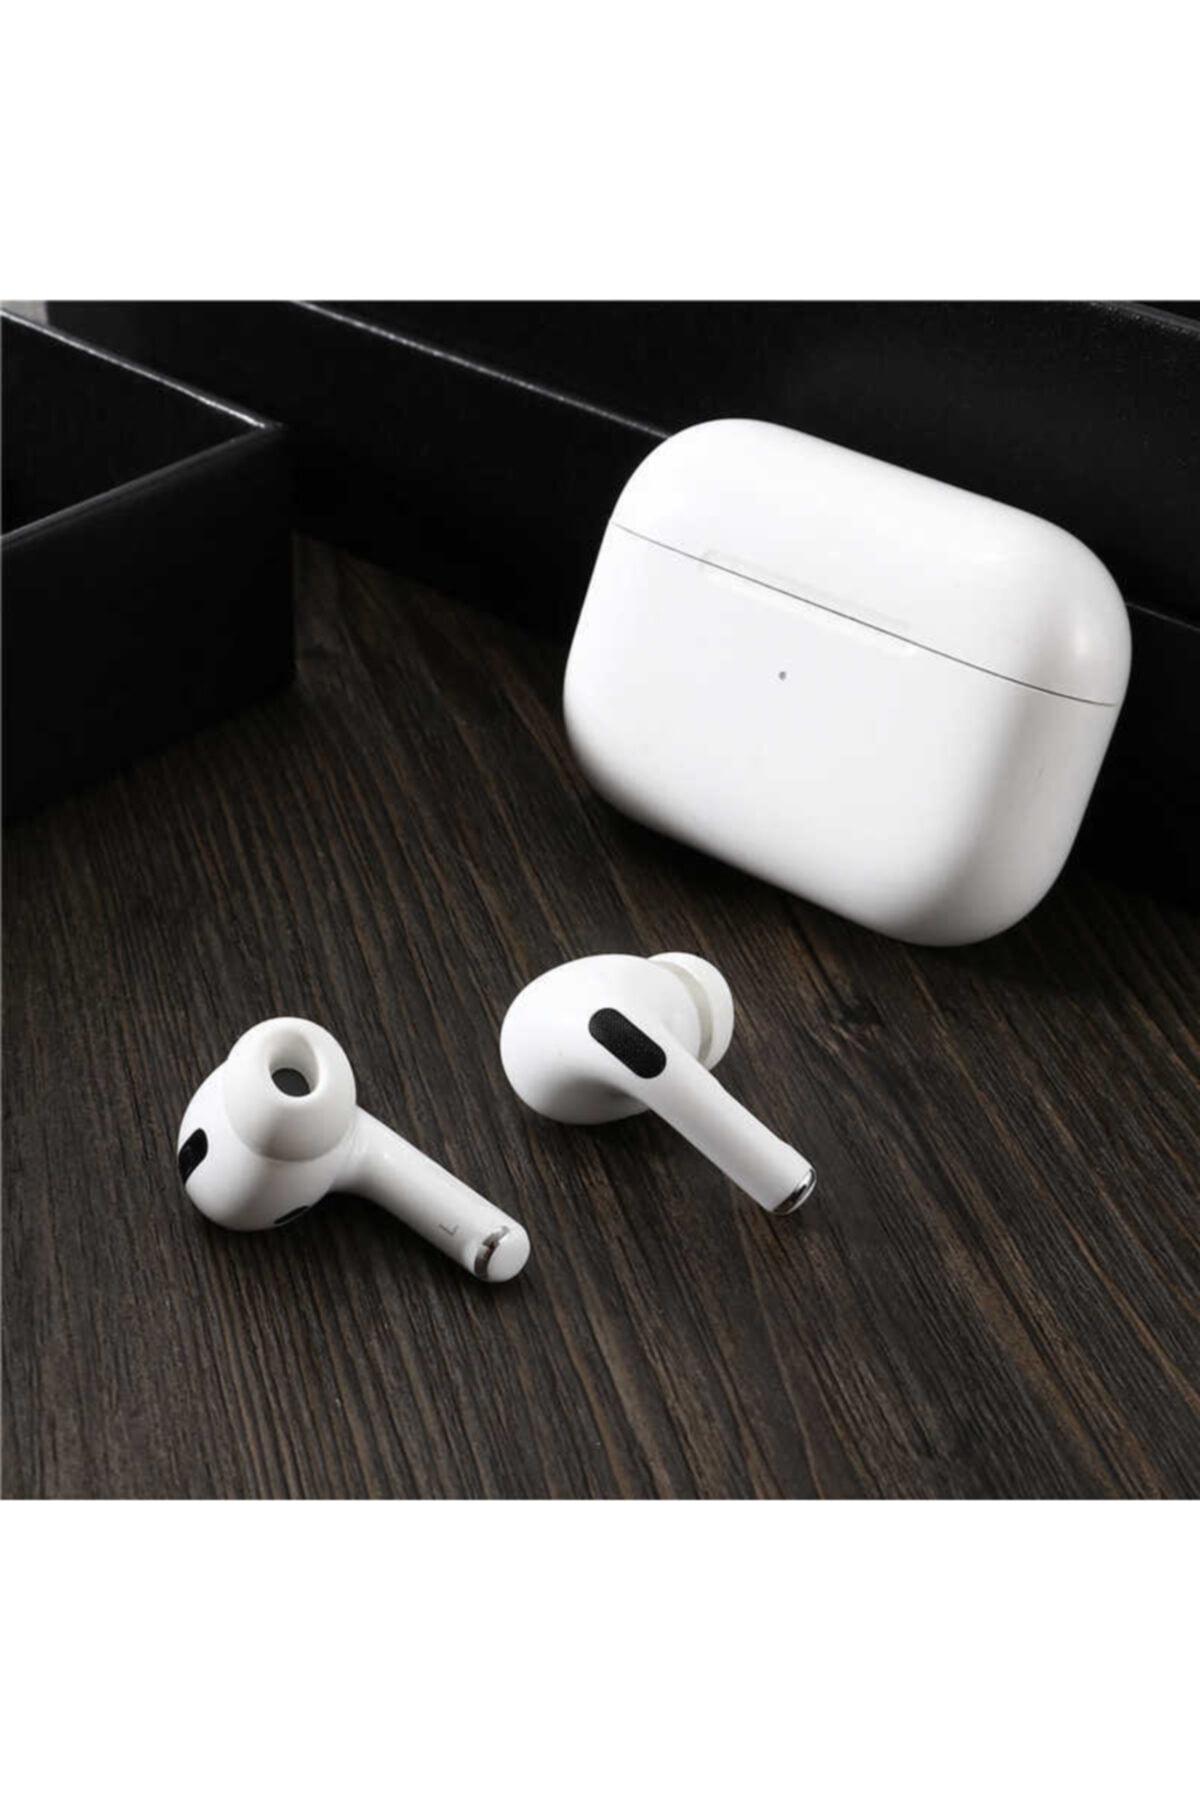 zore Airpods Pro Uyumlu Kulaklık Ucu Silikon 2